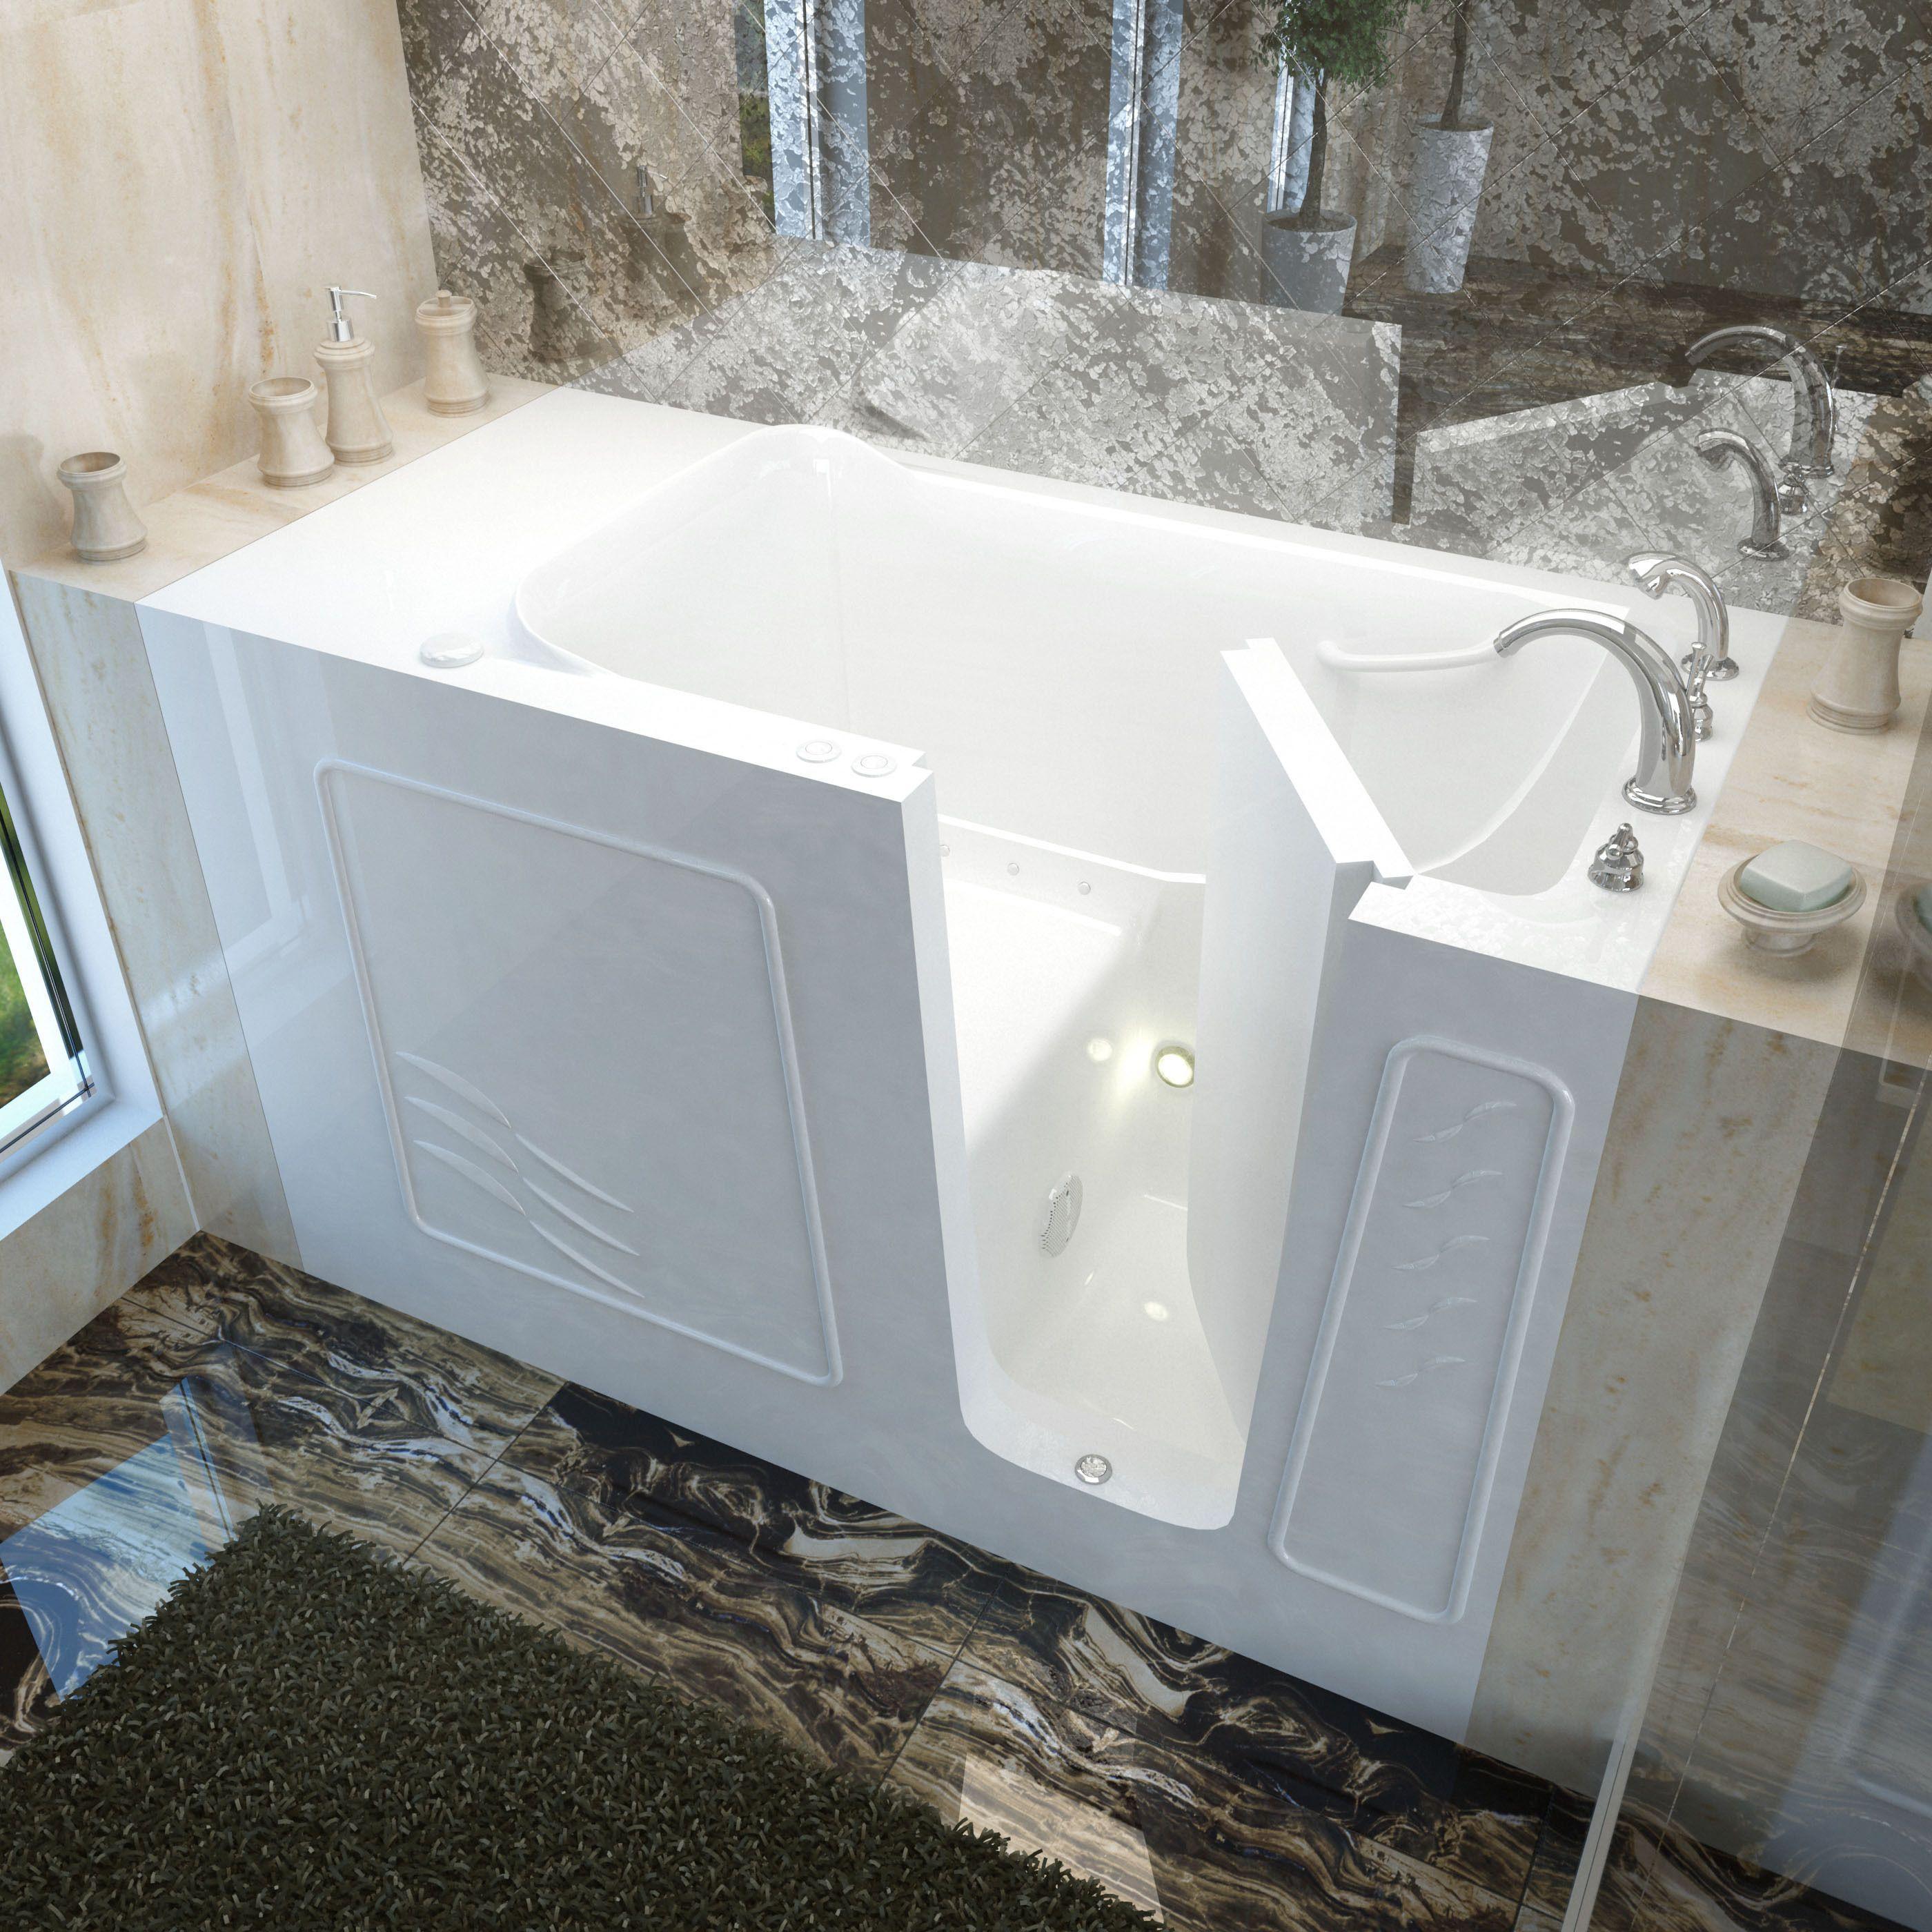 MediTub 30x60-inch Right Drain White Air Jetted Walk-In Bathtub ...